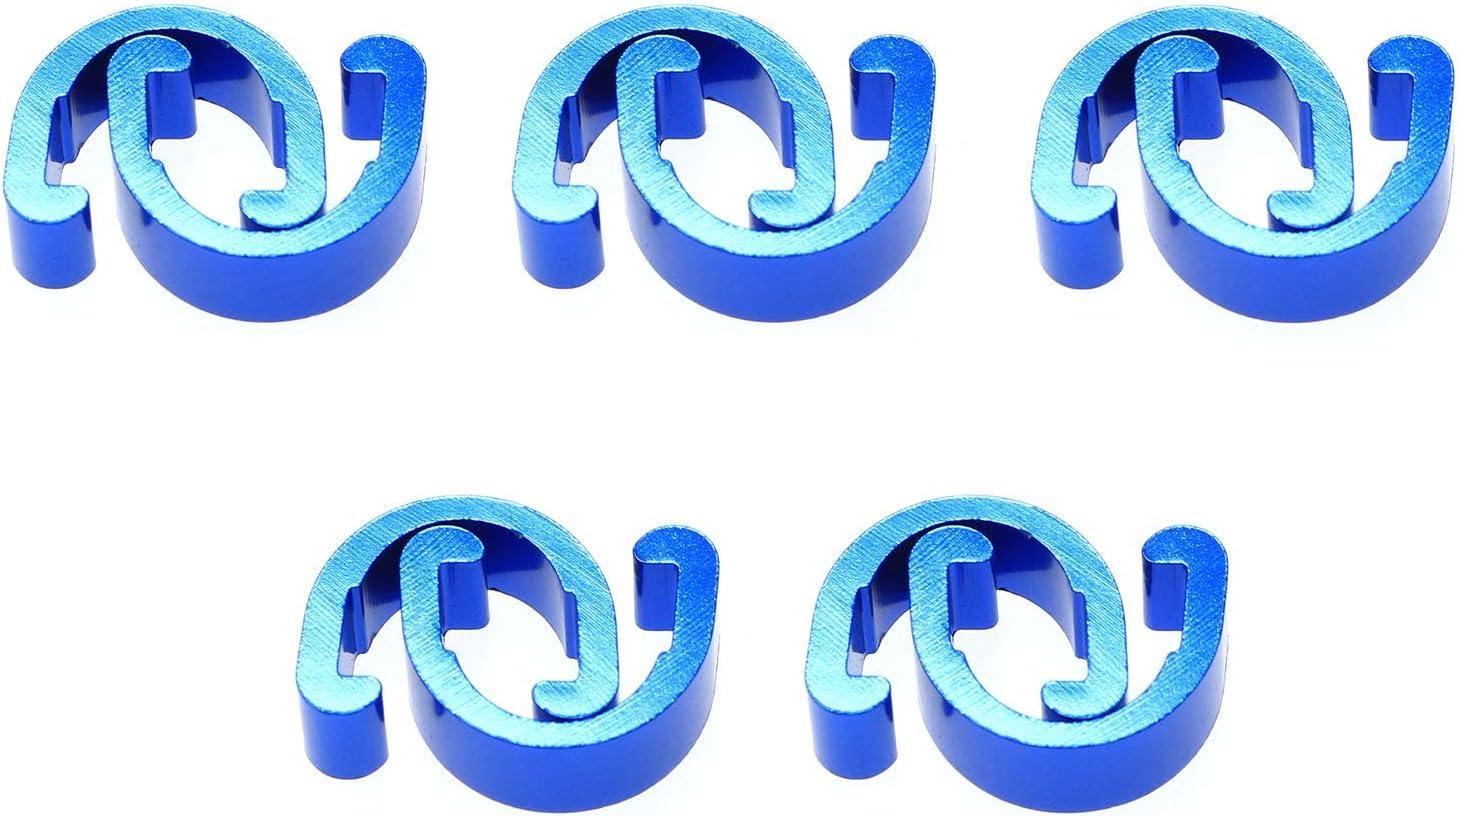 DTTRA Outlet SALE 10PCS C-Clips 70% OFF Outlet Clamps Aluminum Buckle U-Clips Alloy Metal B